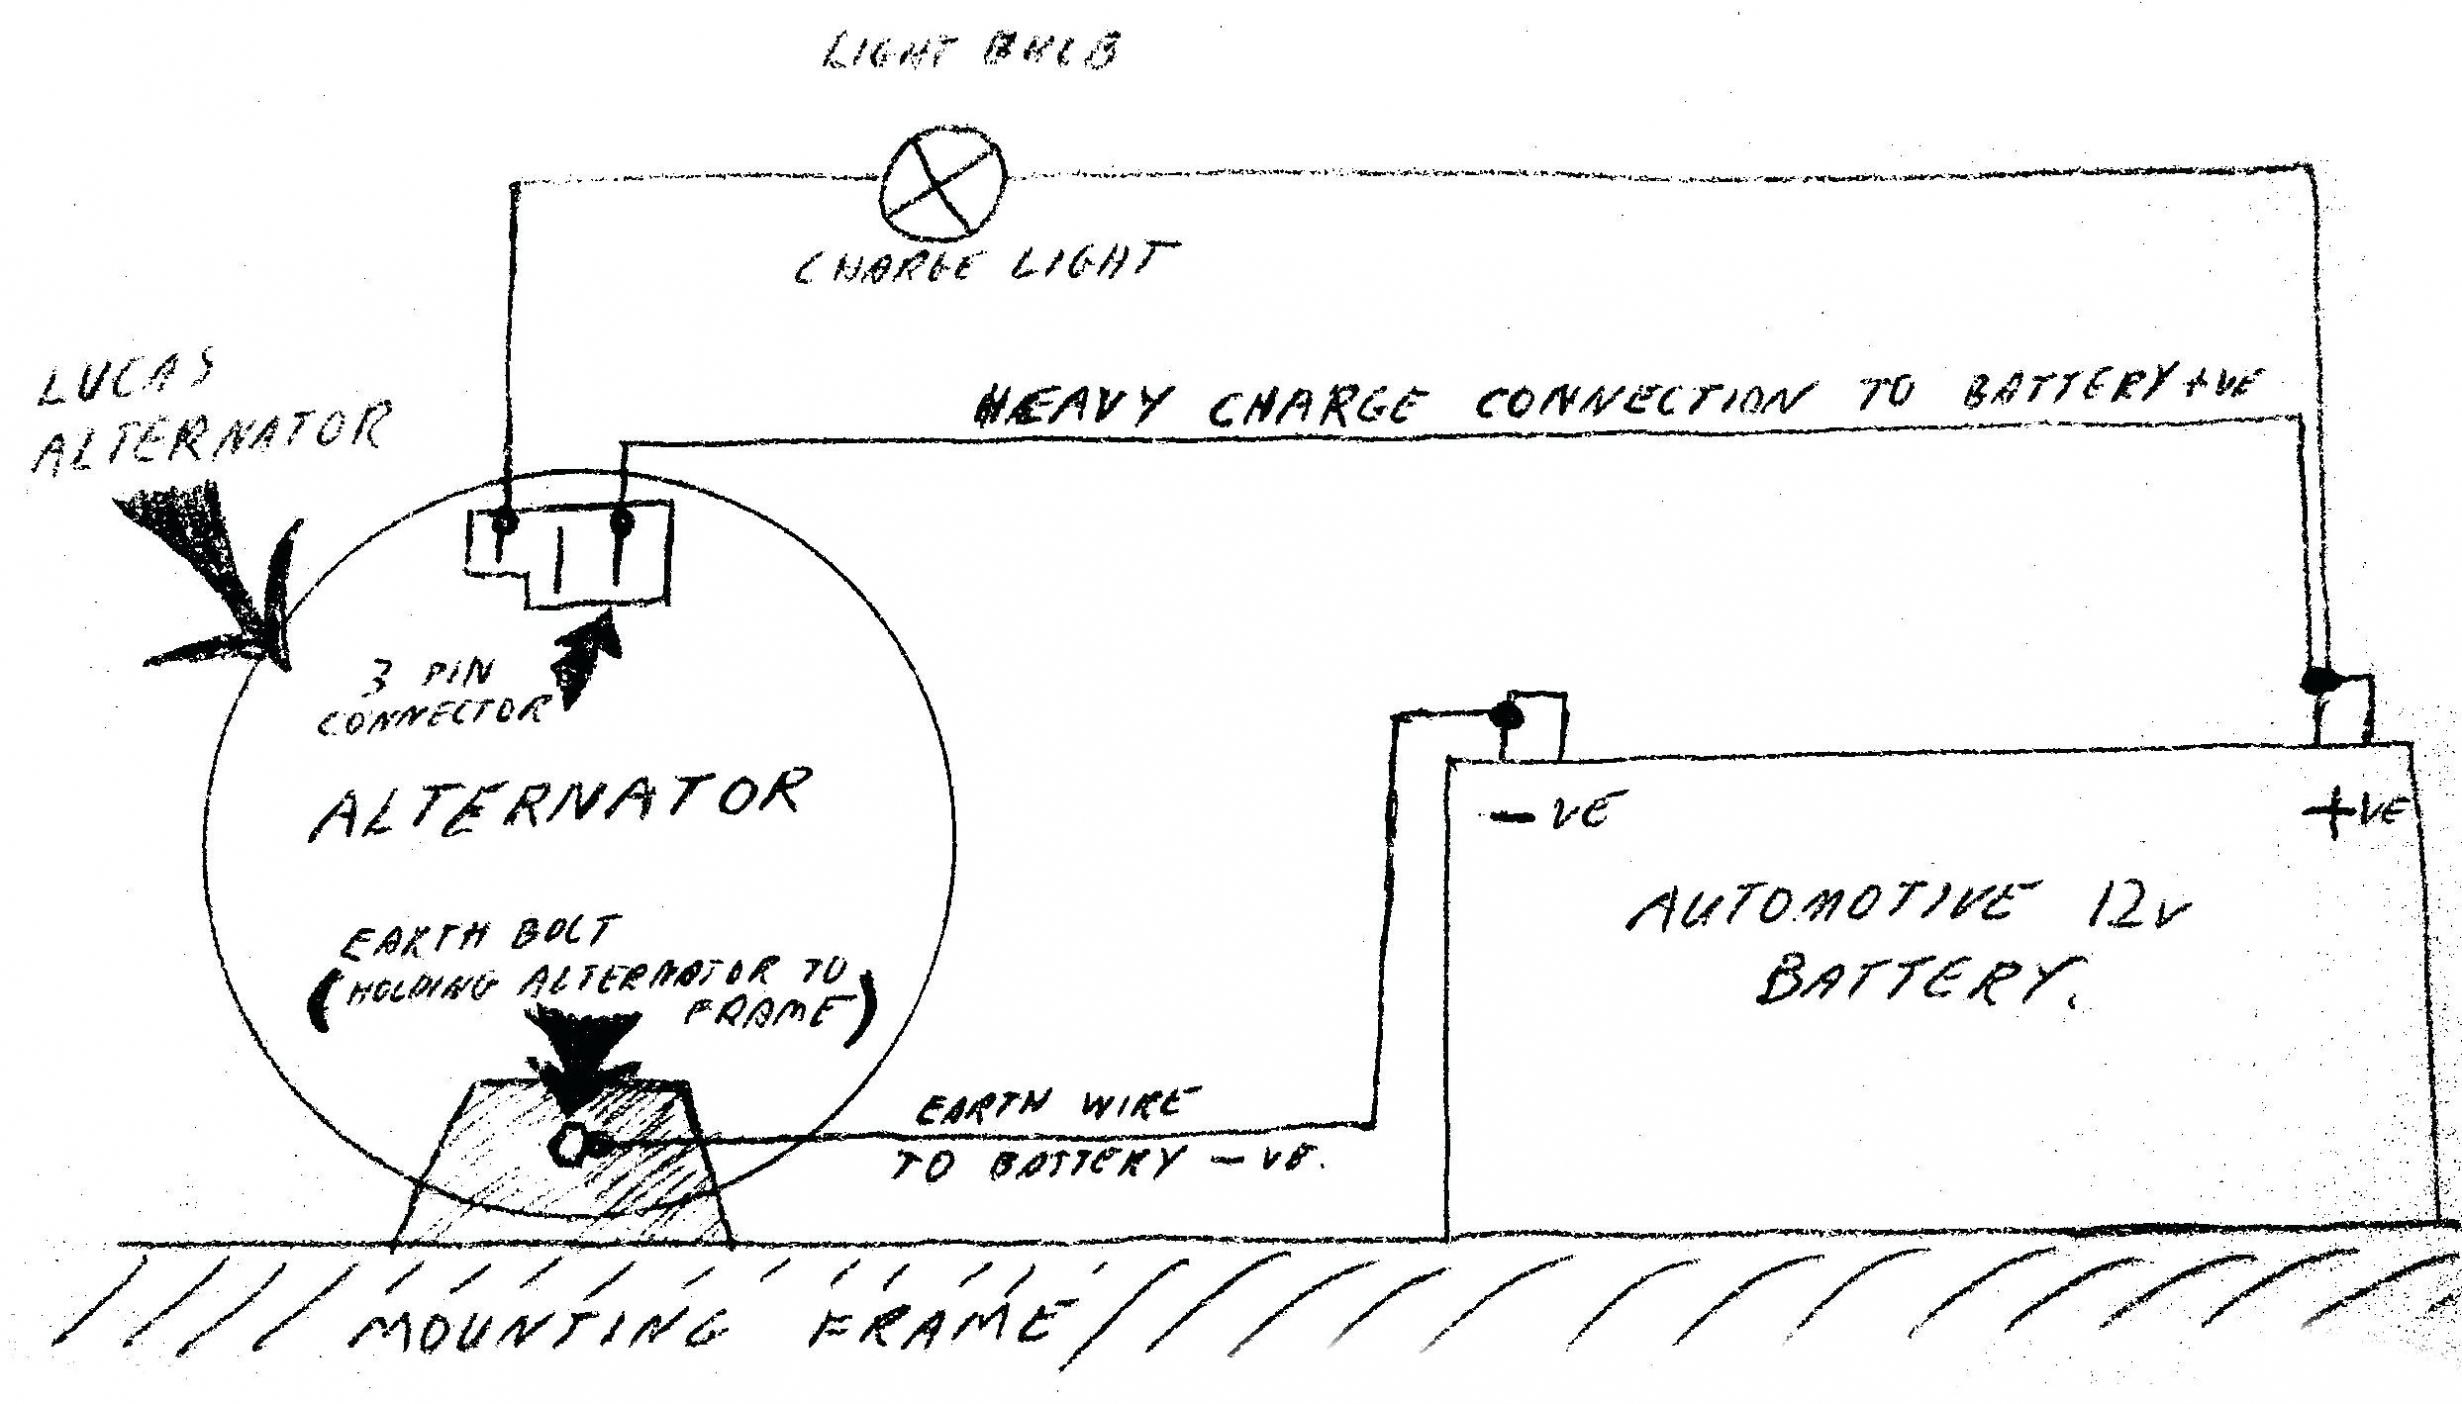 Gm Alternator Wiring Diagram Internal Regulator New Gm Alternator - Delco Alternator Wiring Diagram